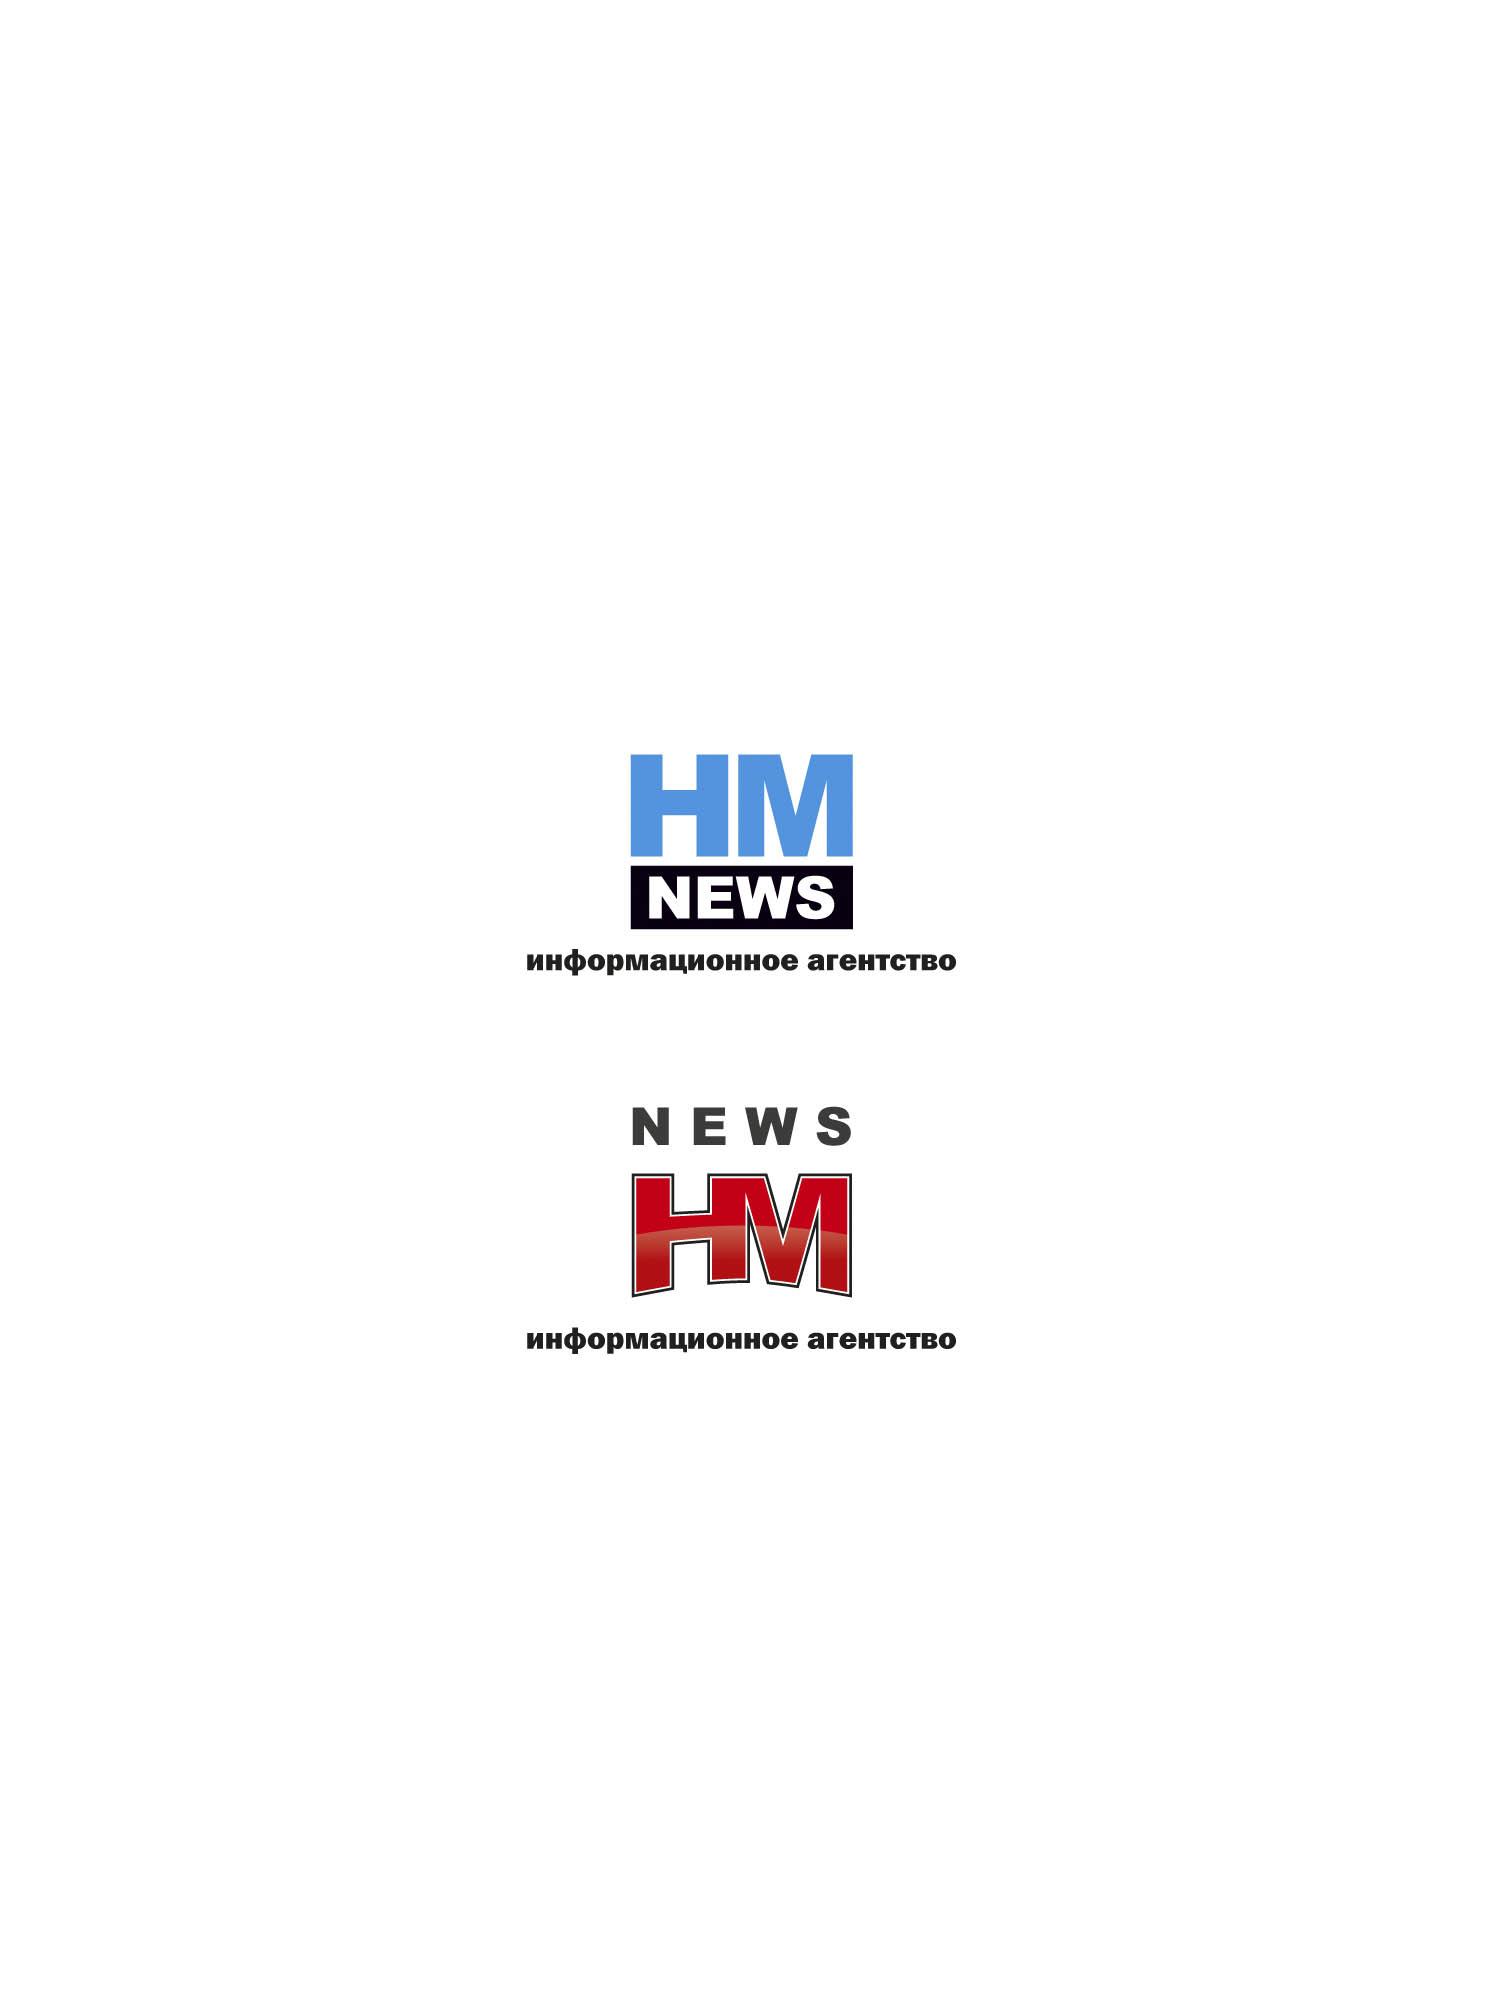 Логотип для информационного агентства фото f_8395aa583d79968c.jpg